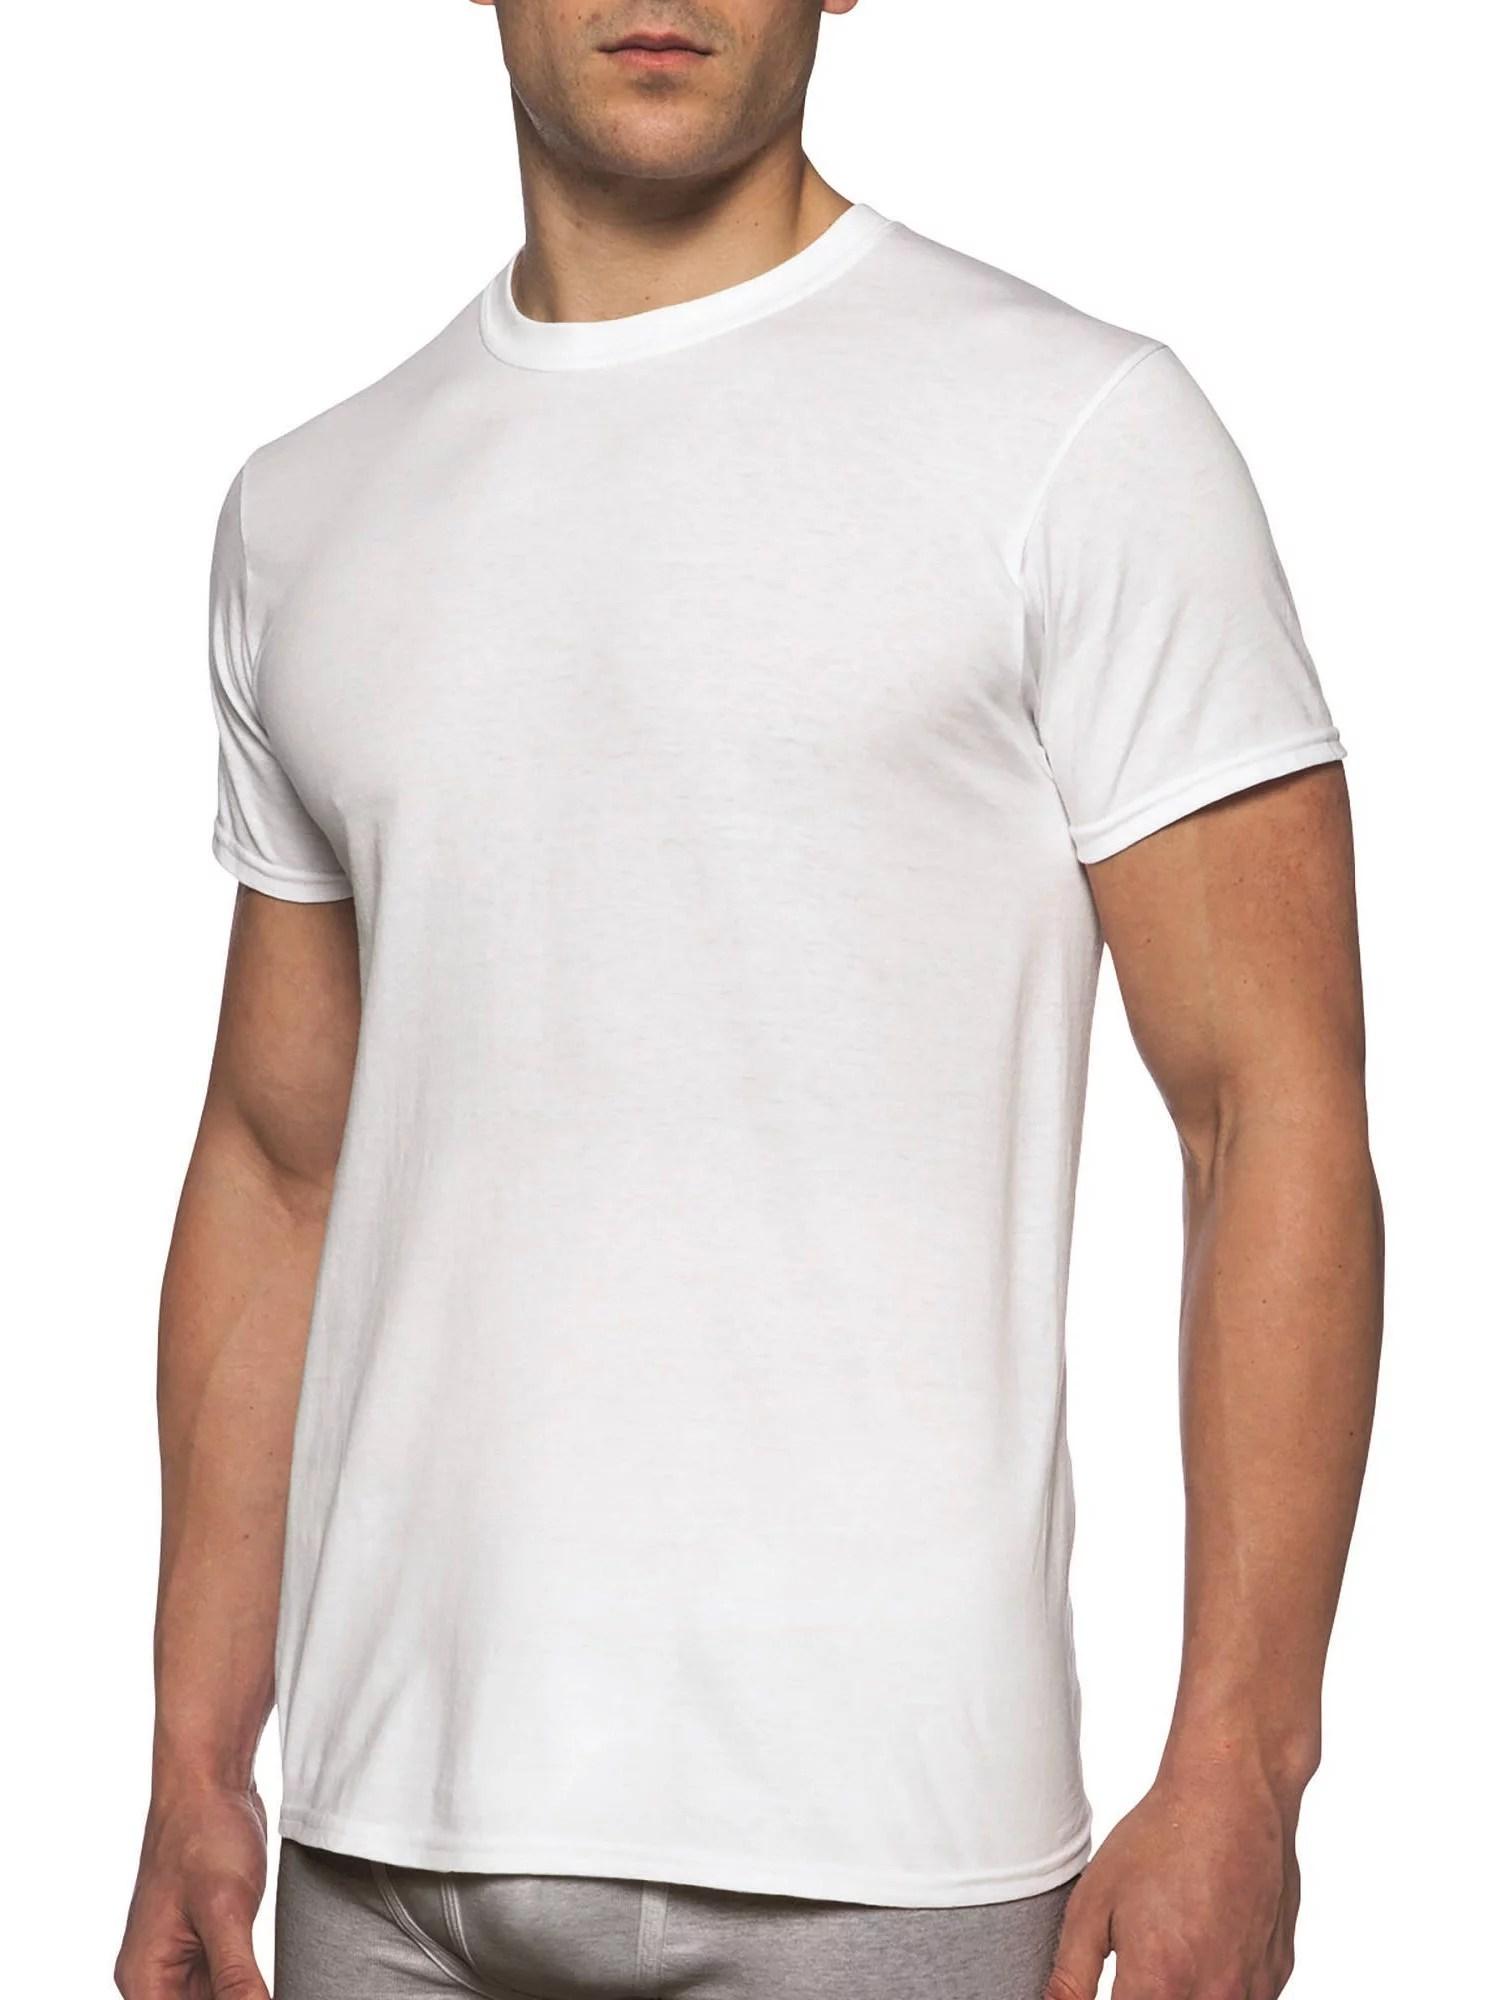 Gildan Mens Short Sleeve Crew White TShirt 6Pack